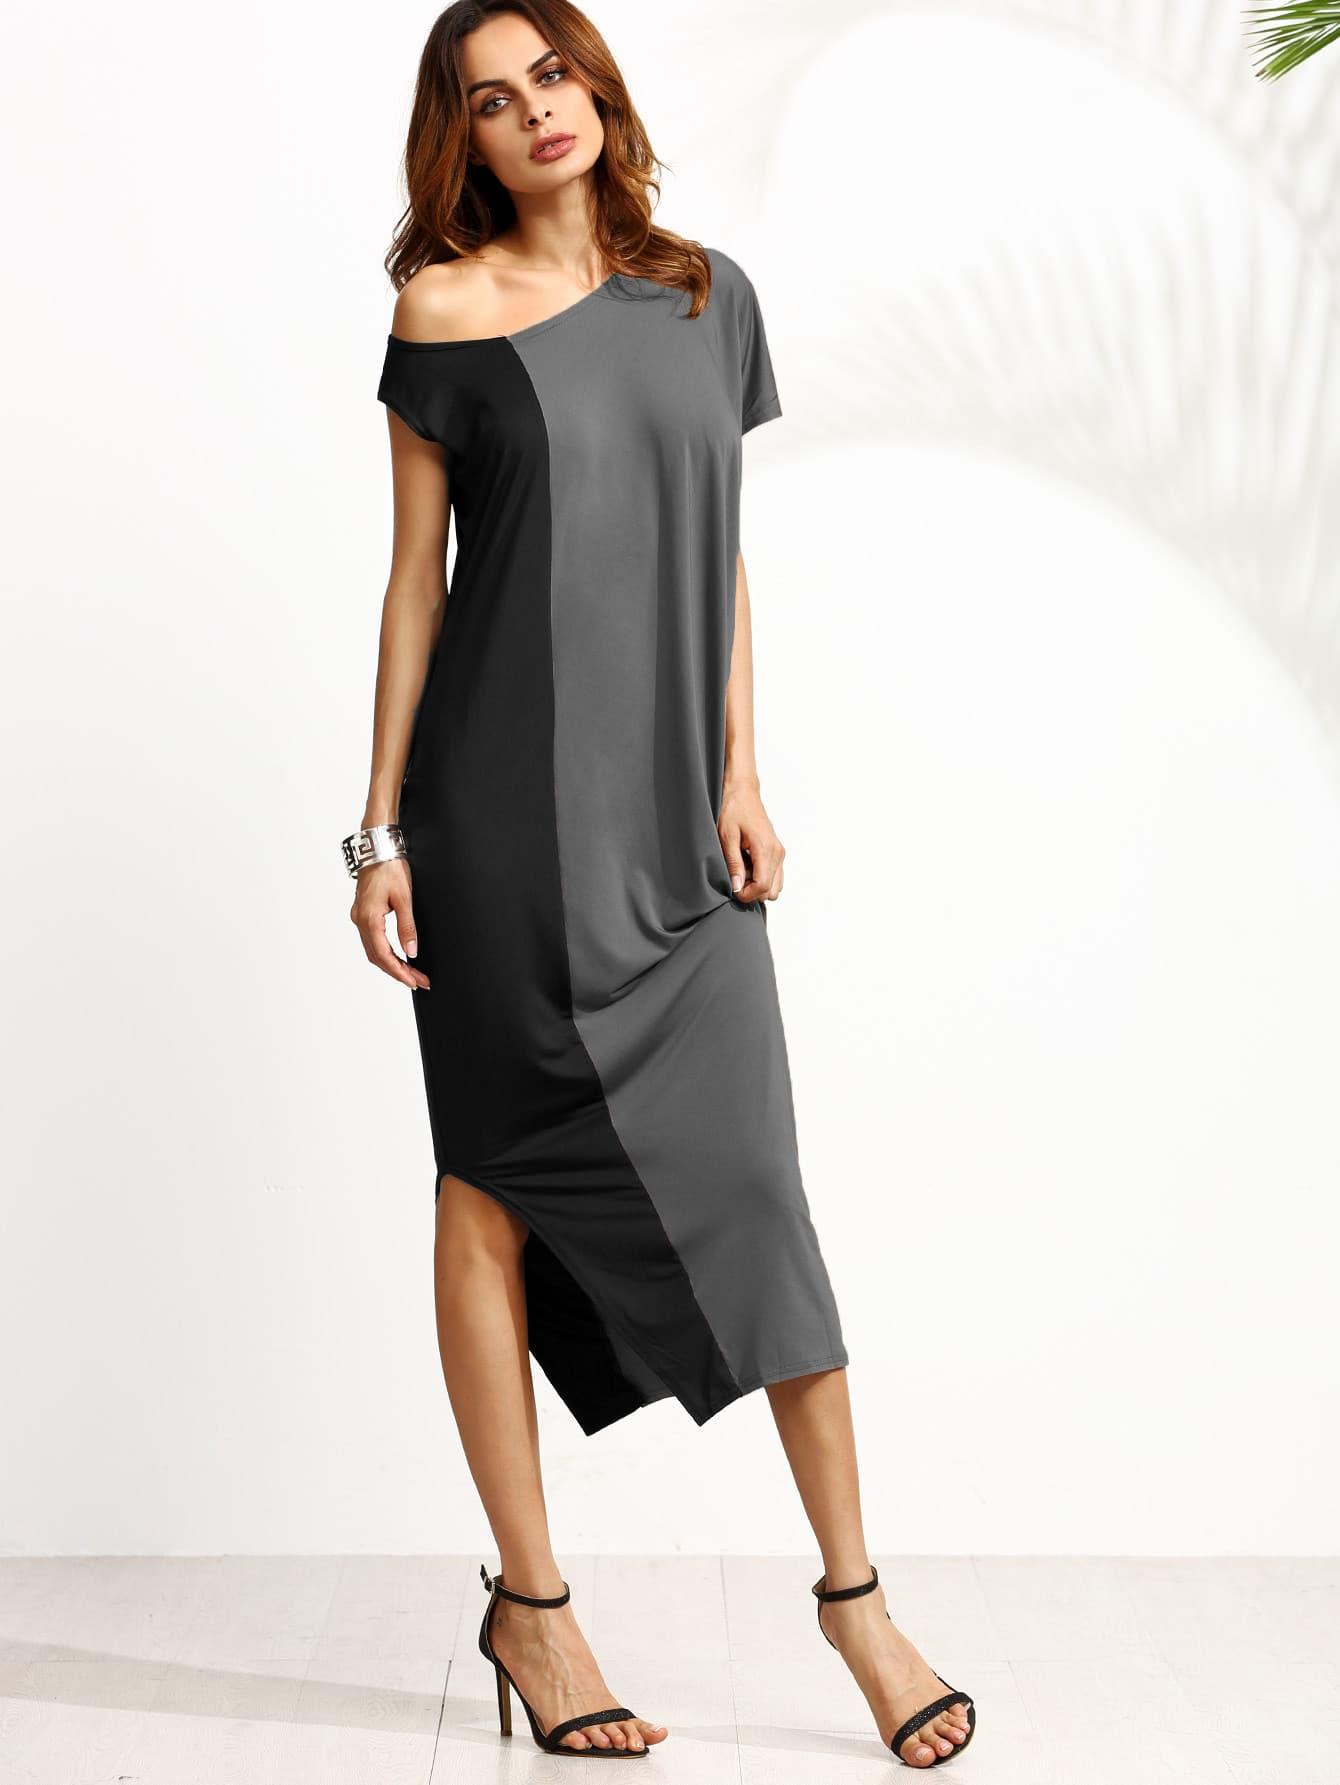 Two Tone Oblique Shoulder Split Dress two tone letter print full length dress